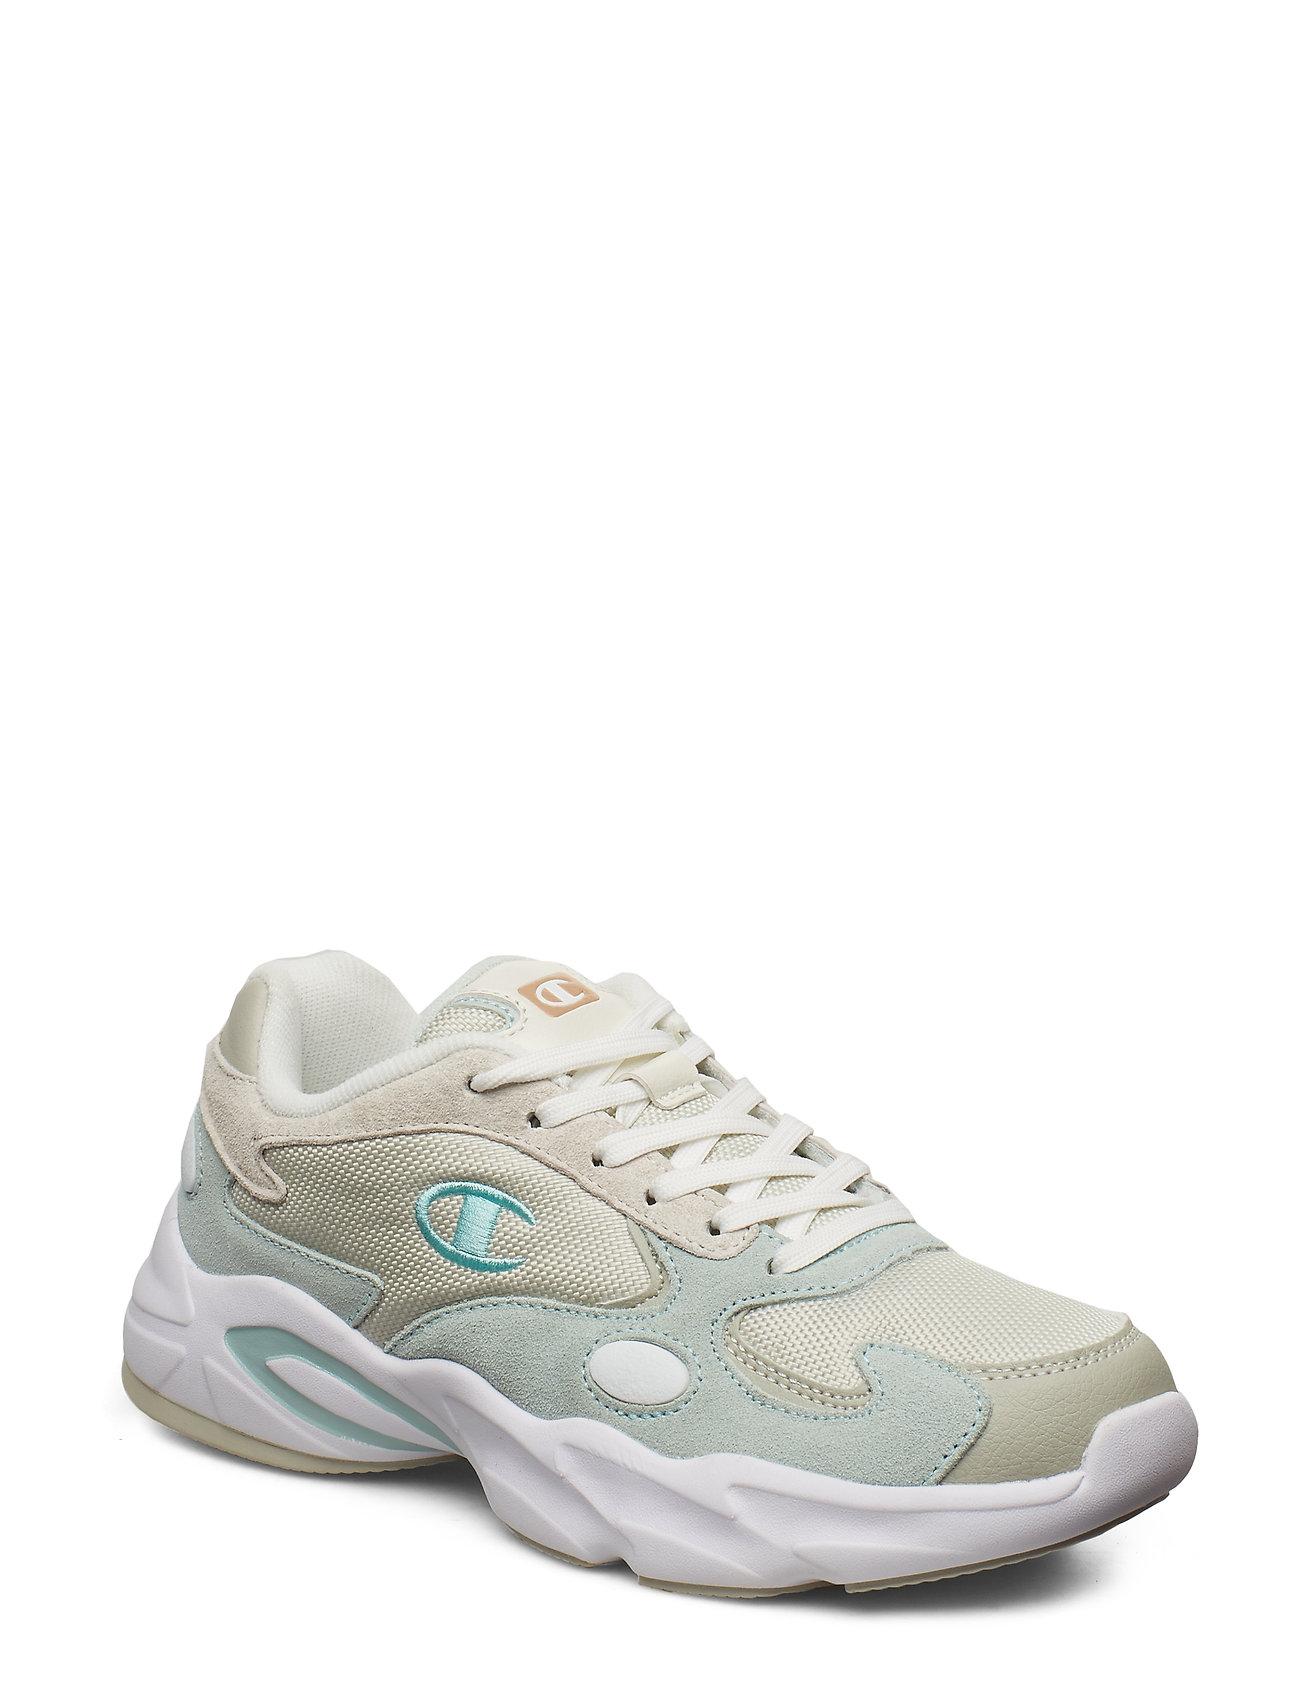 CHAMPION Low Cut Shoe Conway Niedrige Sneaker Weiß CHAMPION